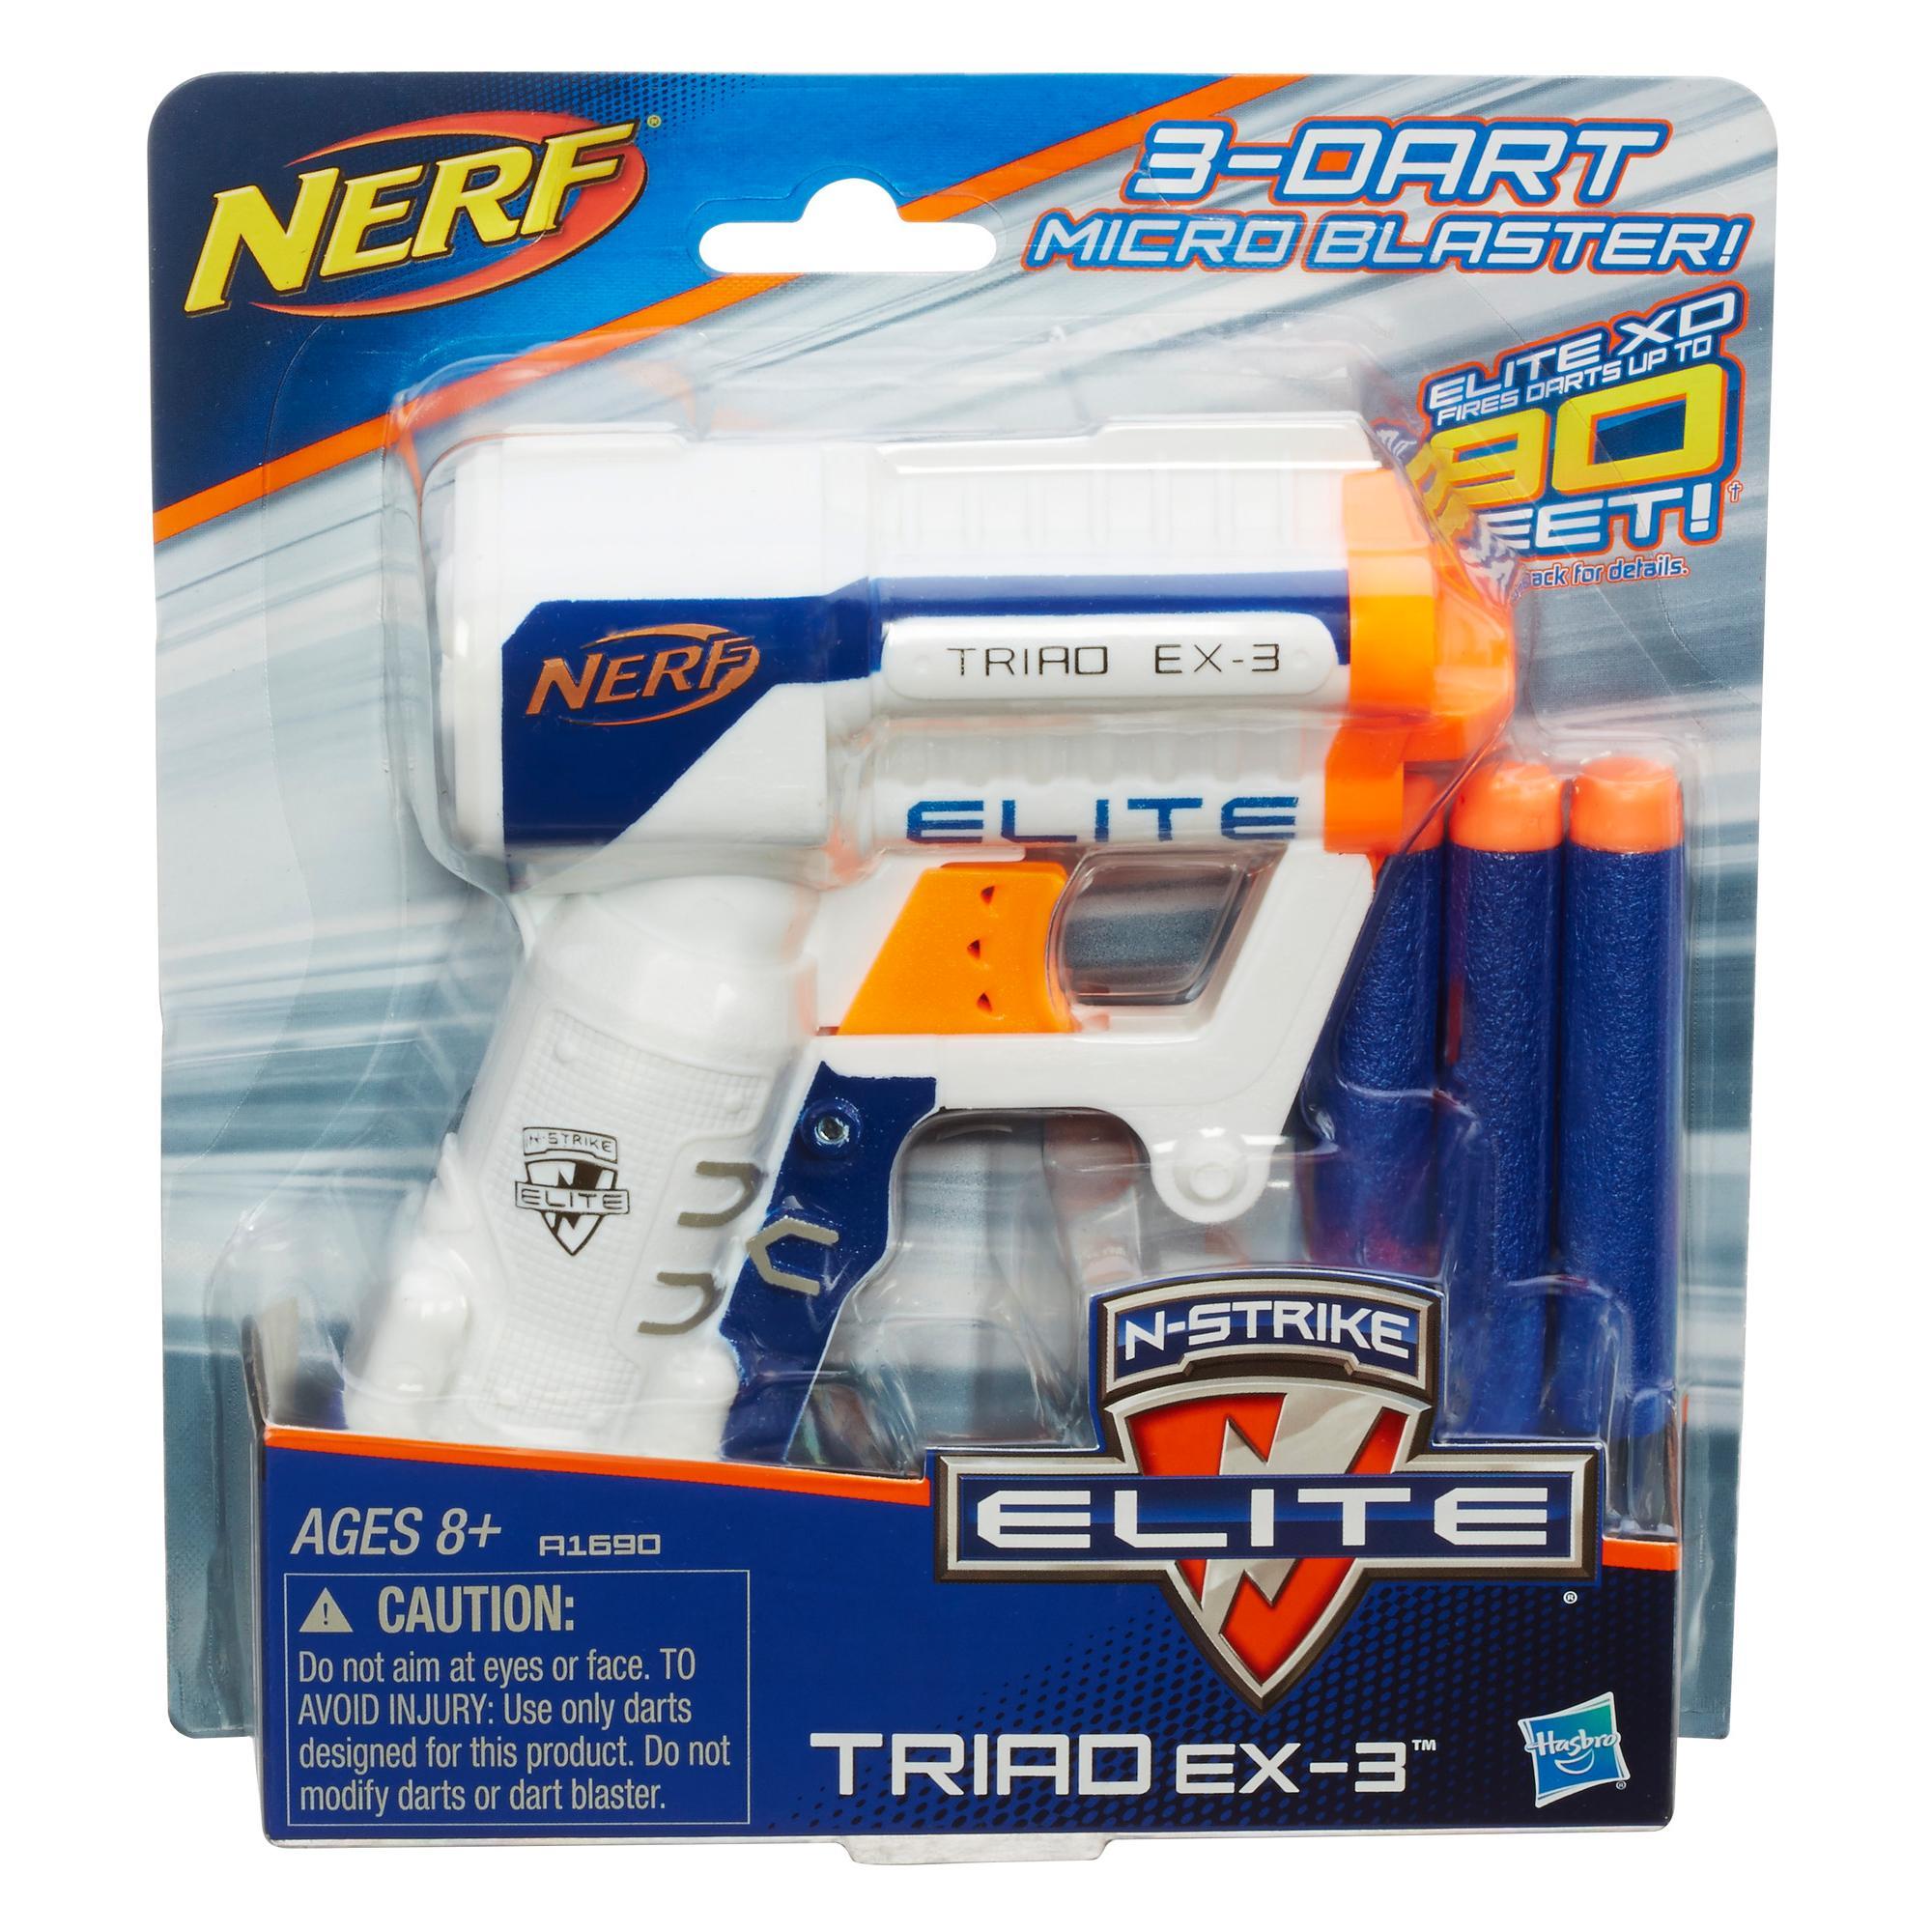 Blaster NERF N-Strike Elite Triad EX3